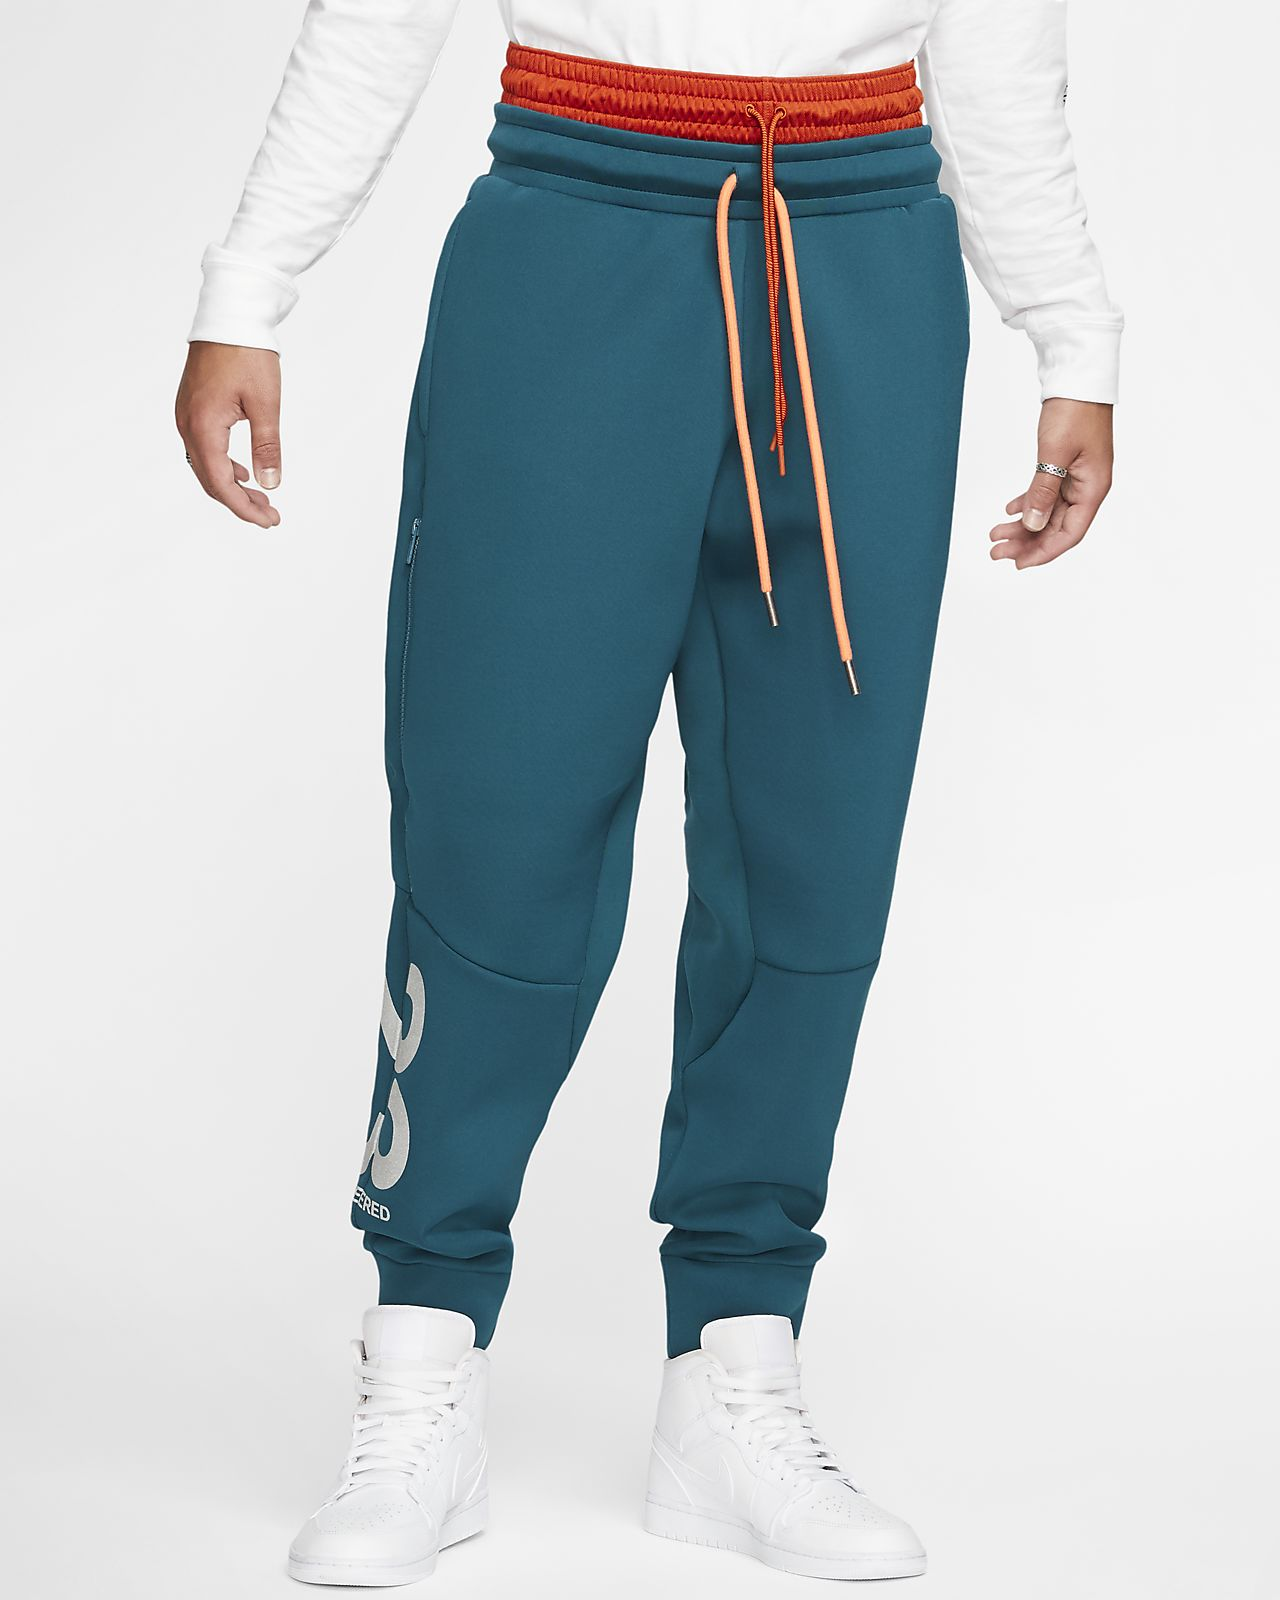 Jordan 23 Engineered Fleece Pants